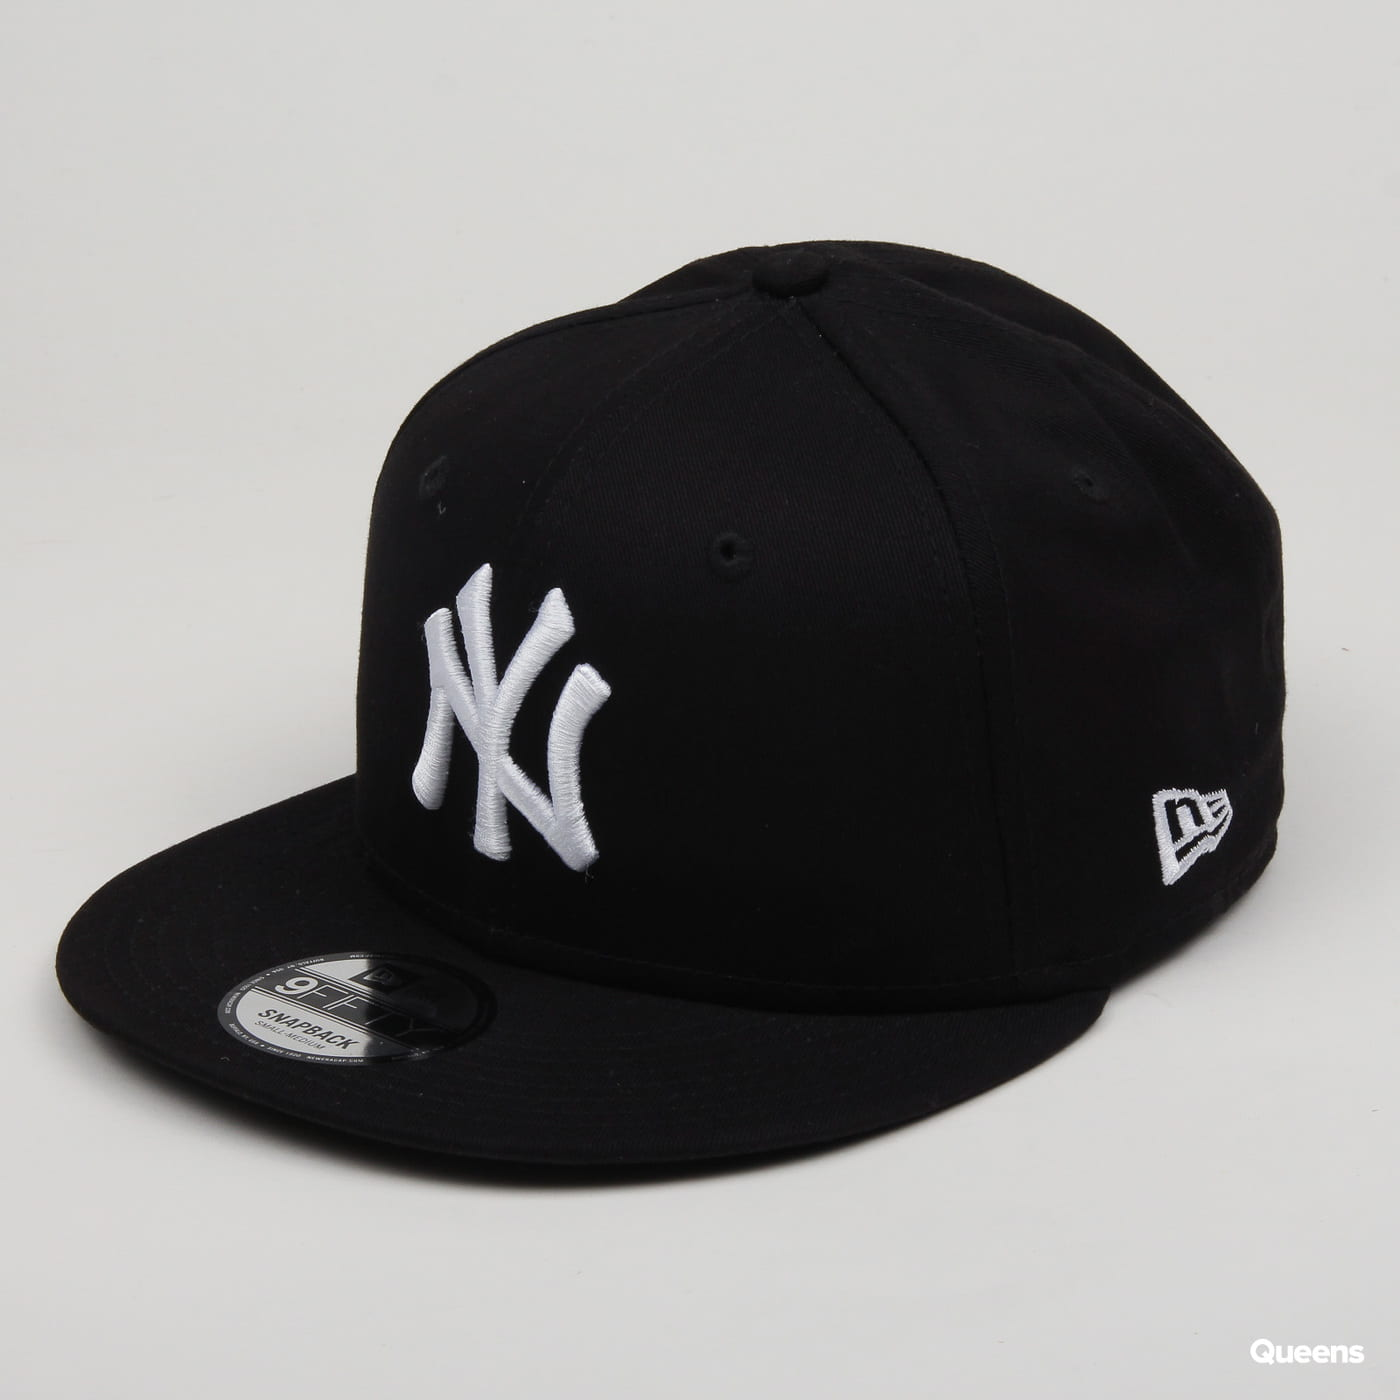 New Era 950 MLB NY C/O čierna / biela